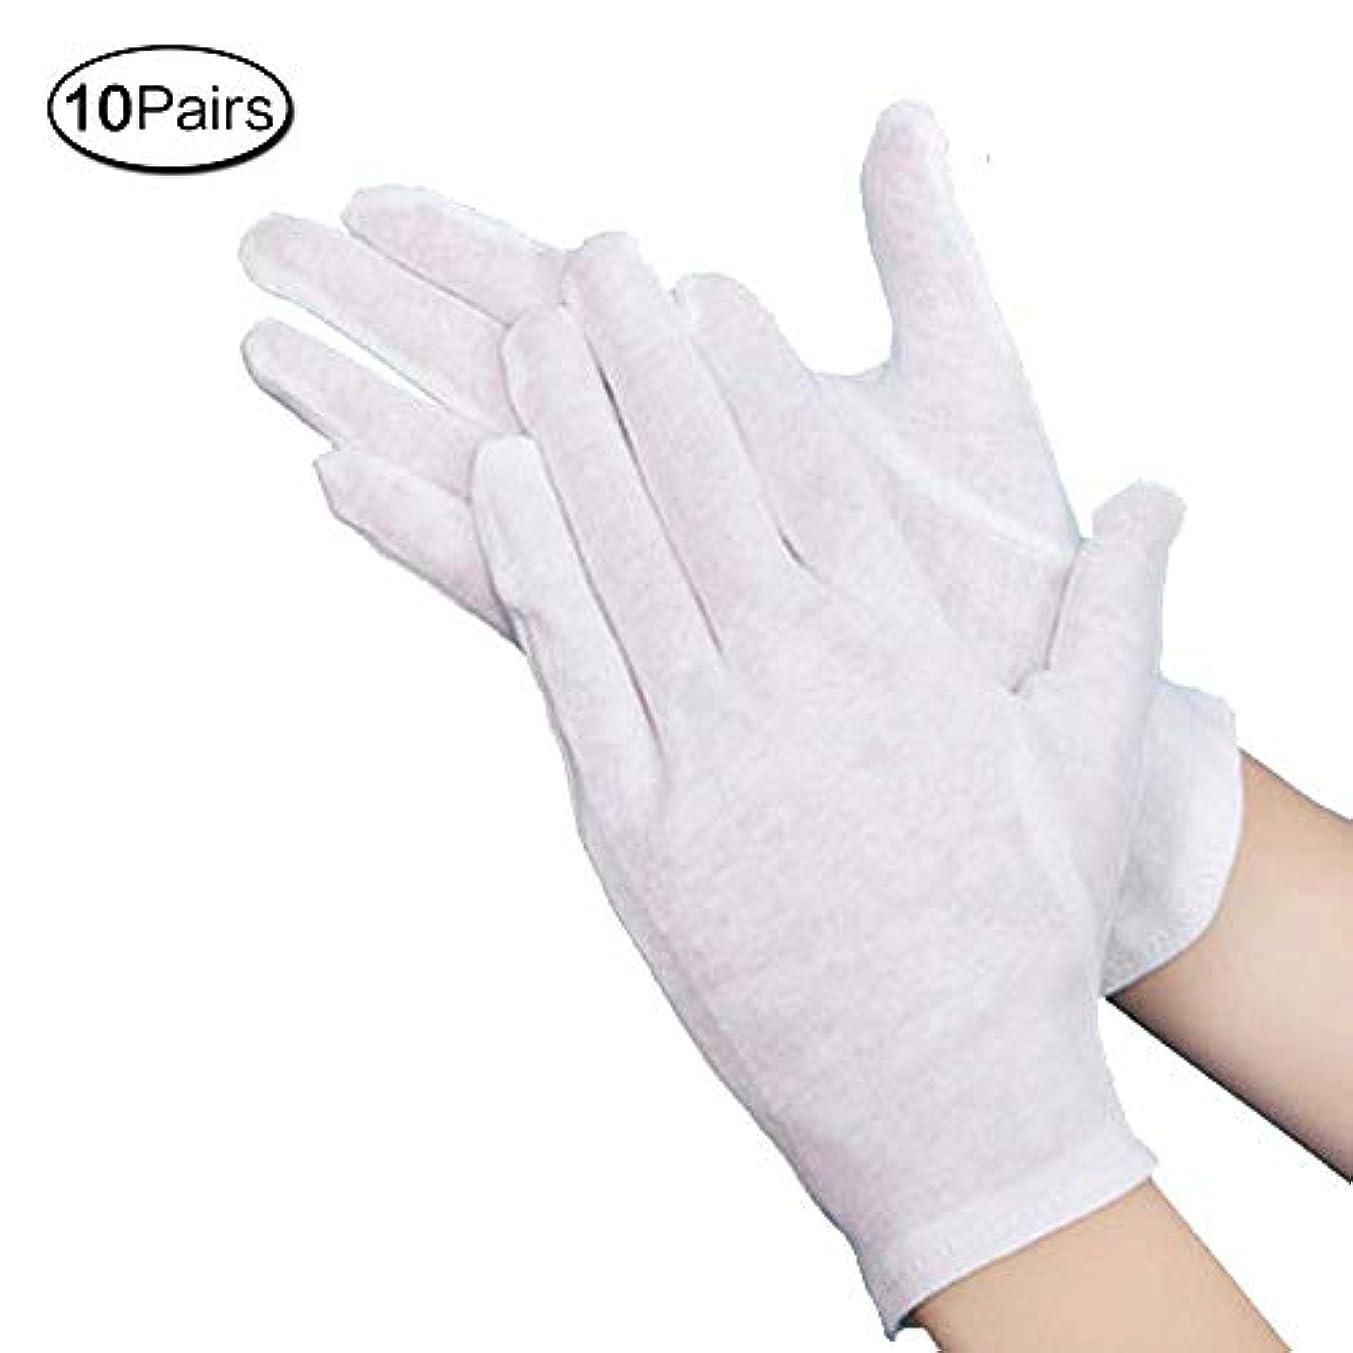 配管工自動打倒綿手袋 純綿100% 通気性 コットン手袋 10双組 M